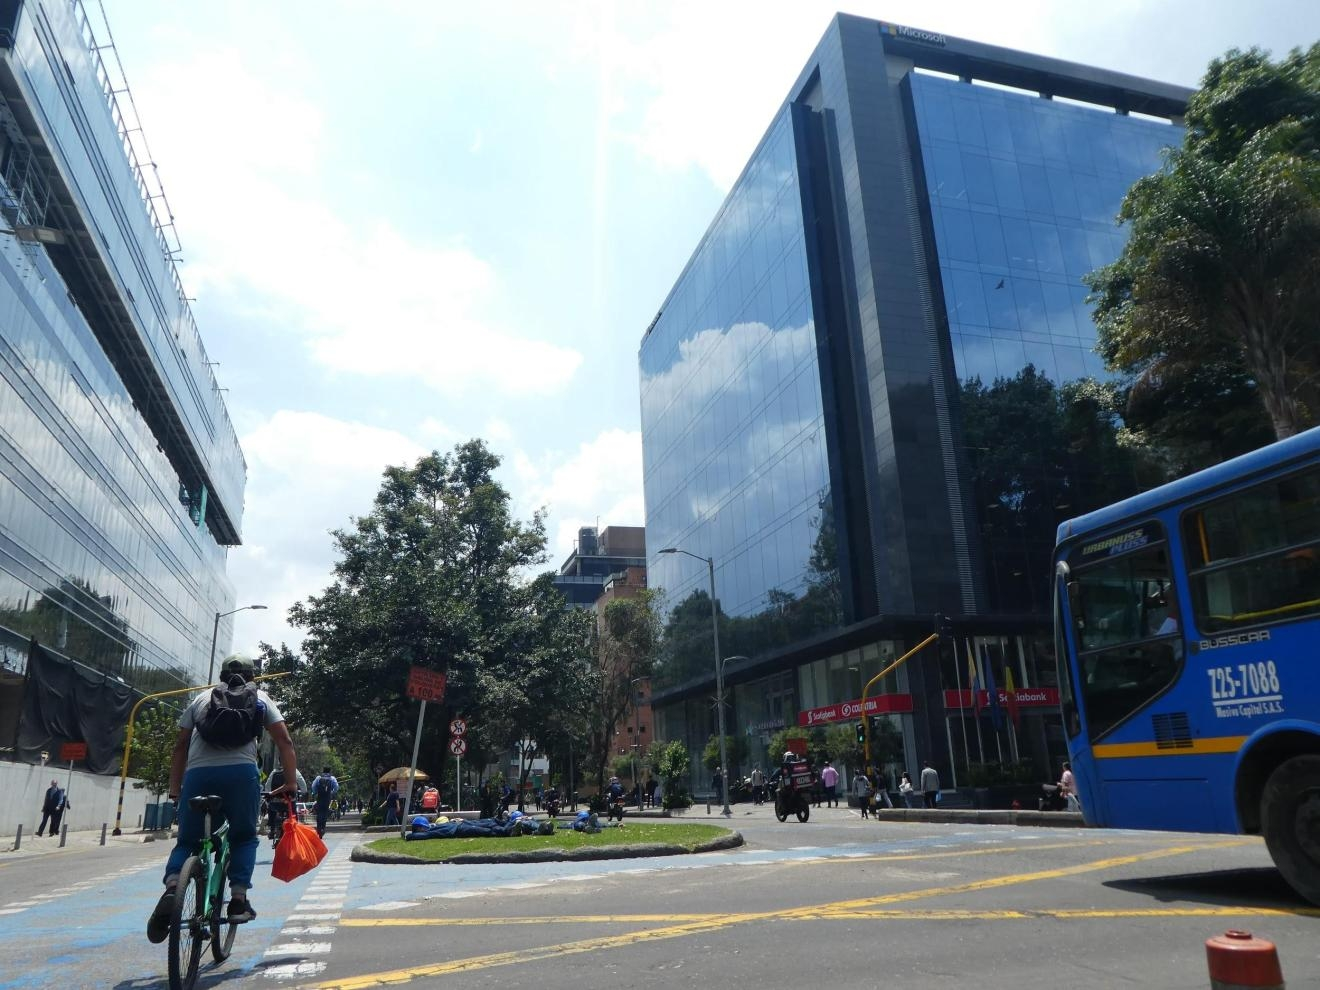 Cyclist on the street in Bogotá